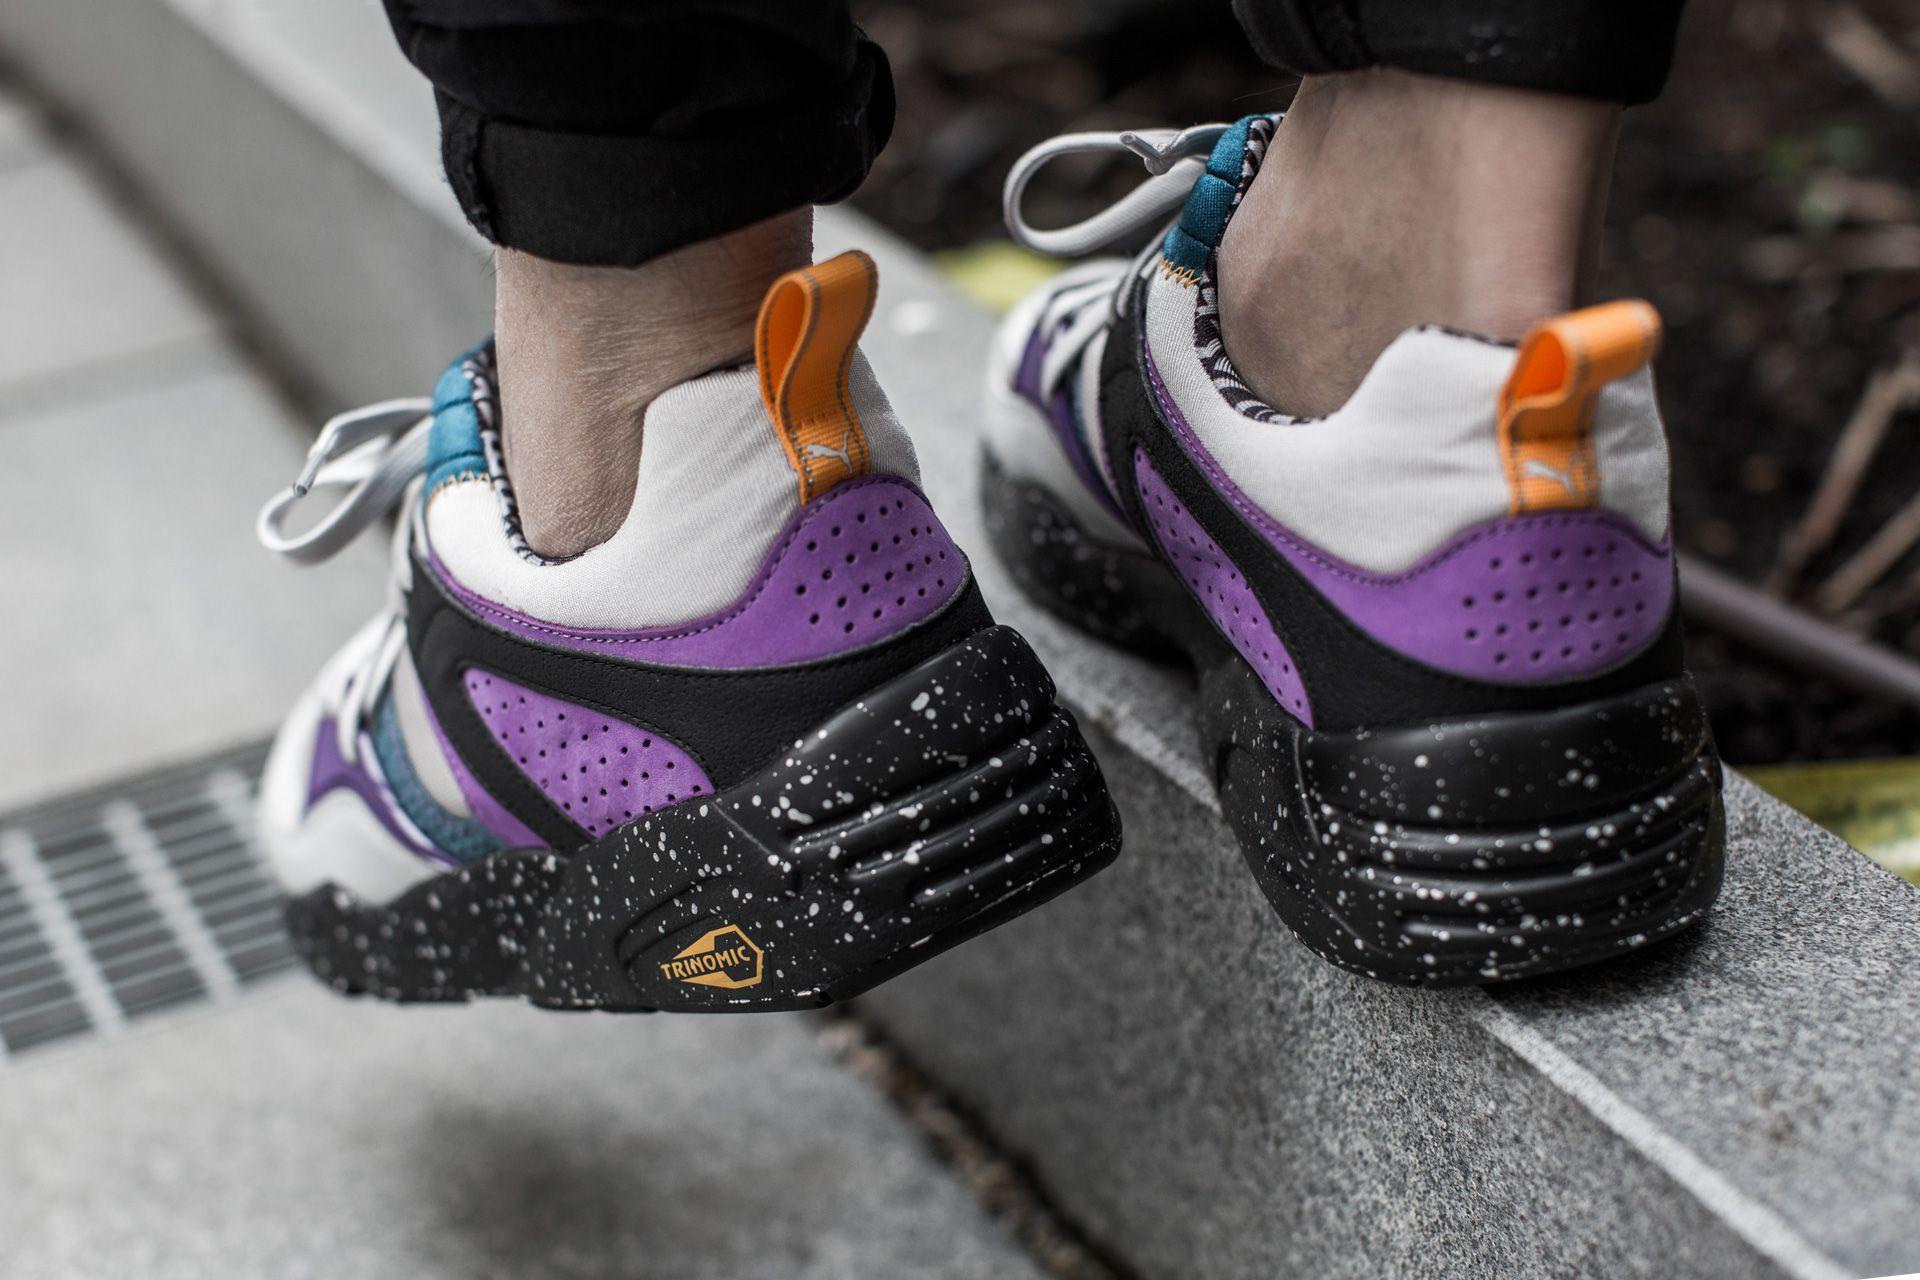 73f82748dc6 PUMA BLAZE OF GLORY X ALIFE shop online here   www.tint-footwear.com blaze-of-glory-alife-01 puma x alife collaboration  collab blaze of glory speckle sole ...